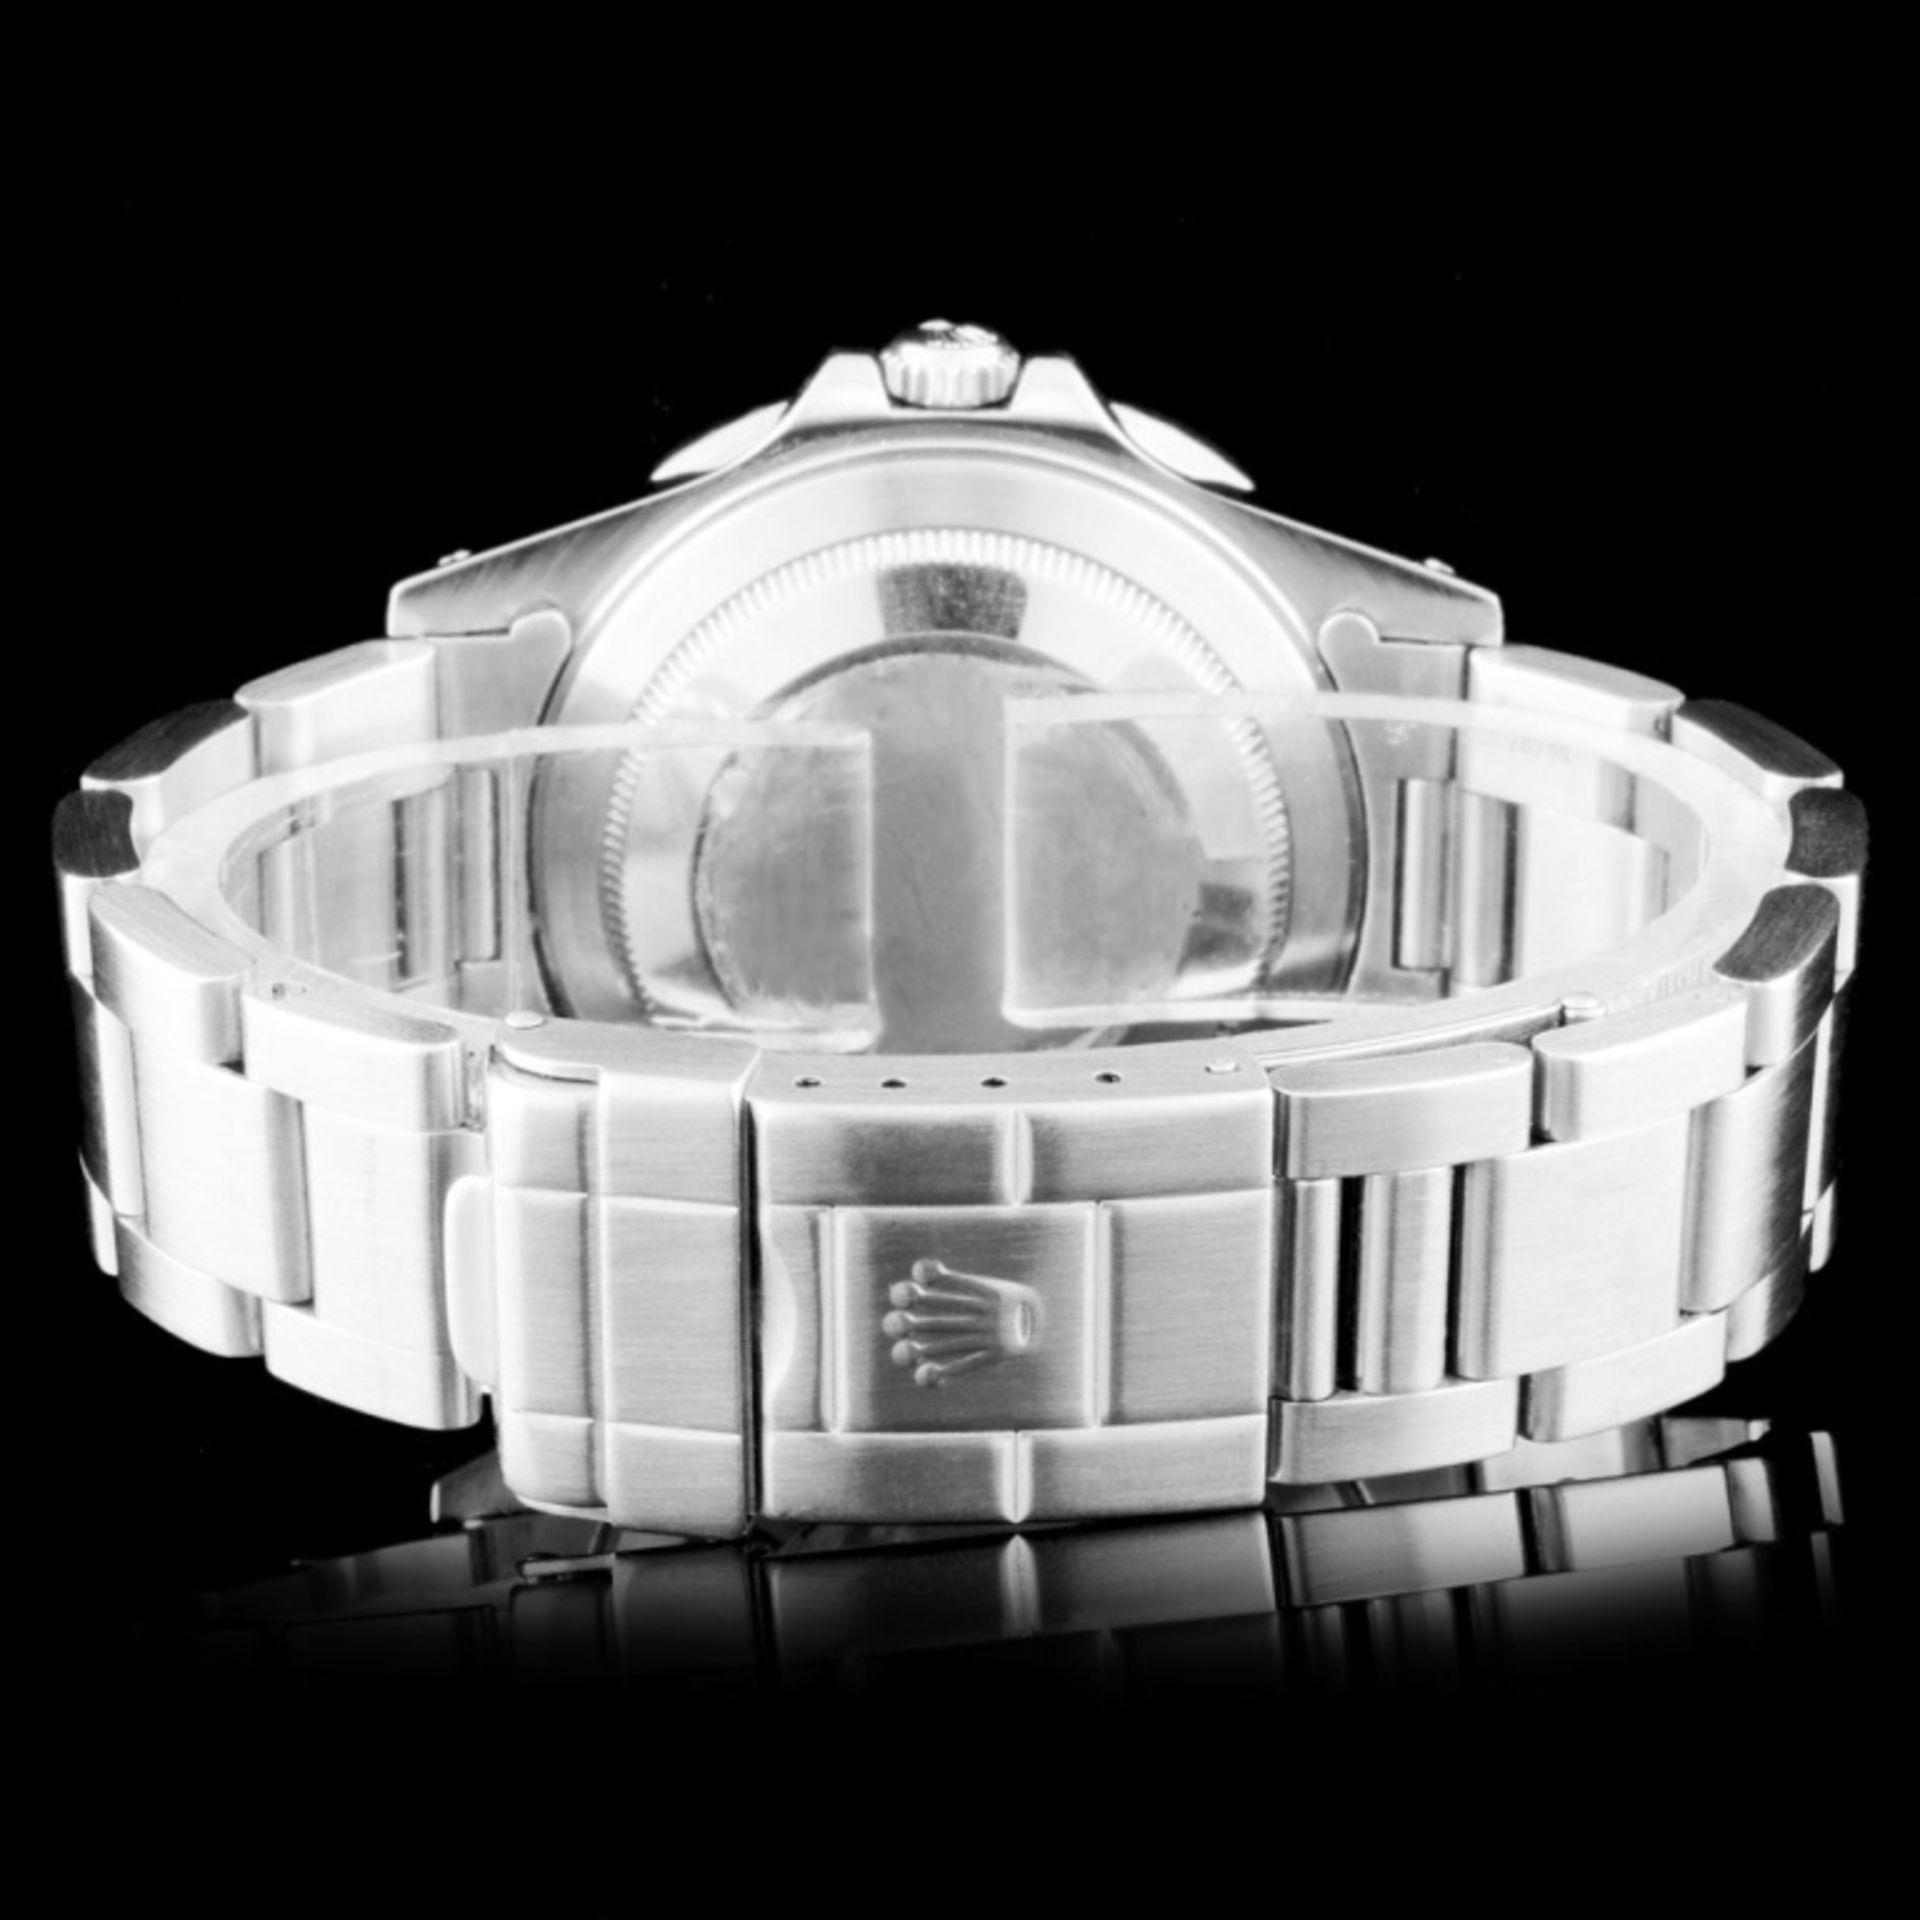 Rolex Submariner SS 40MM Diamond Wristwatch - Image 5 of 7